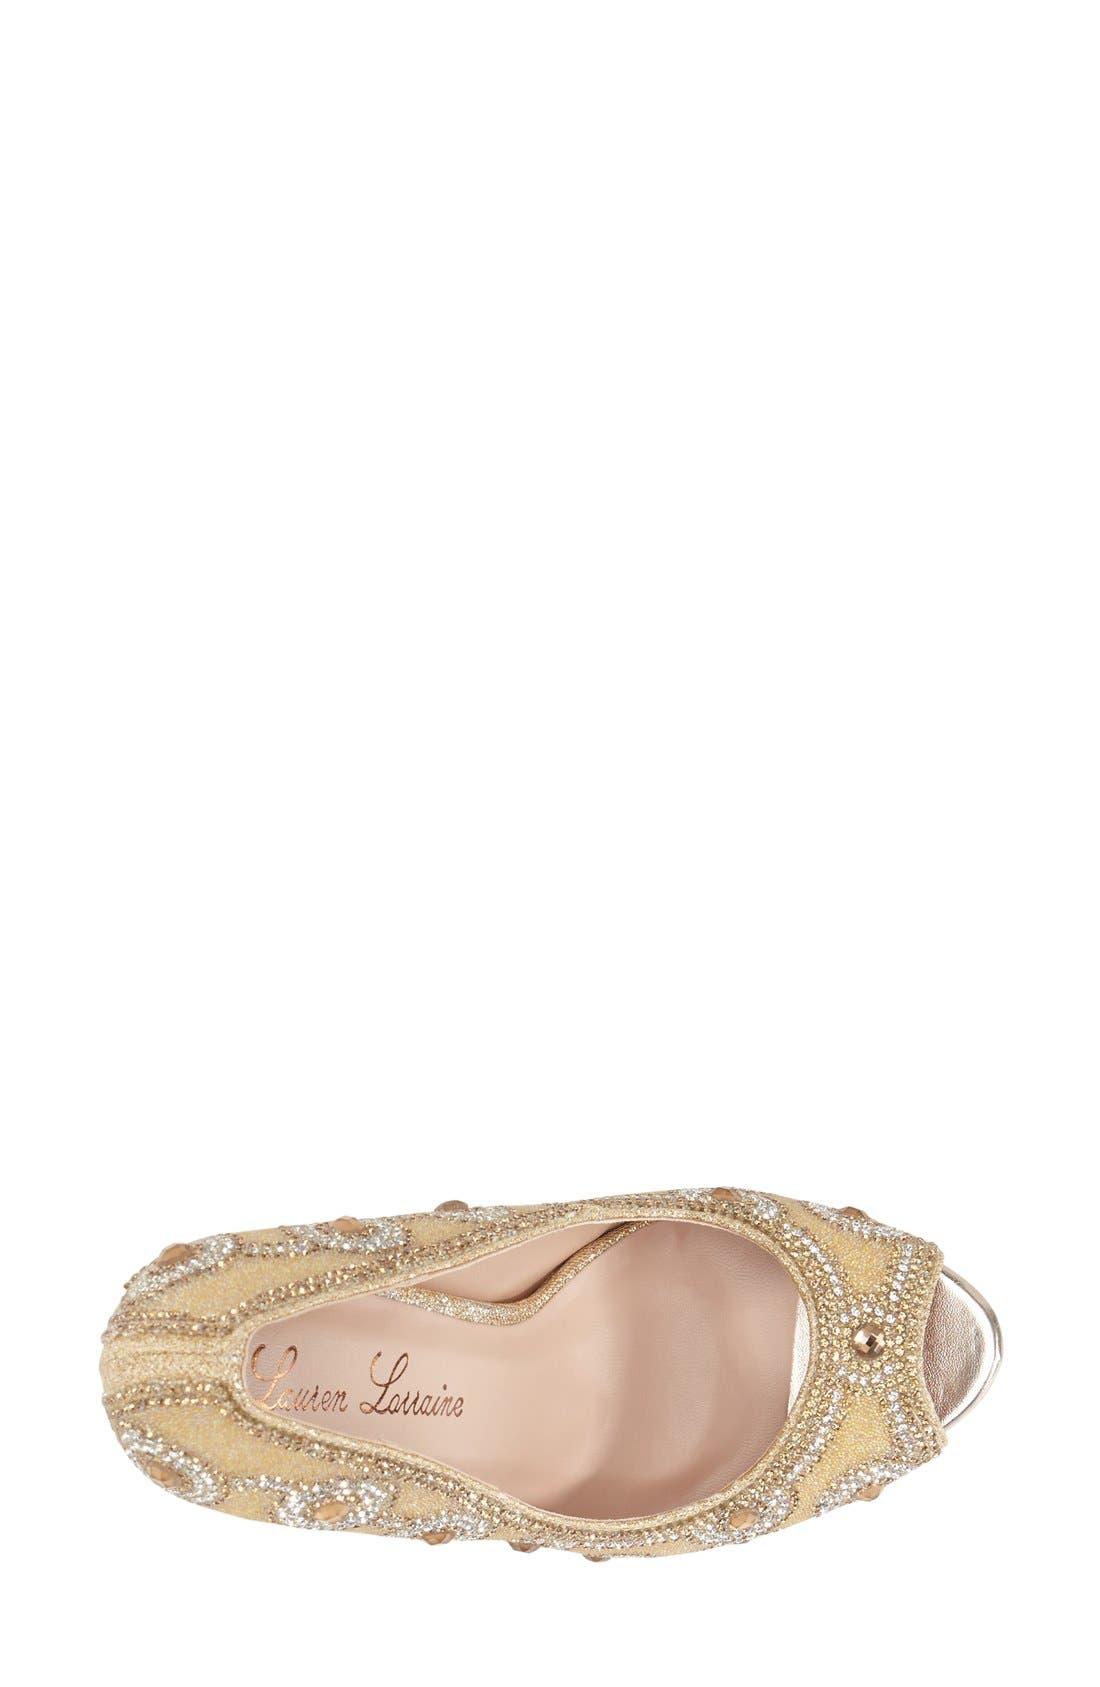 Alternate Image 3  - Lauren Lorraine 'Elenor' Crystal Embellished Peep Toe Pump (Women)